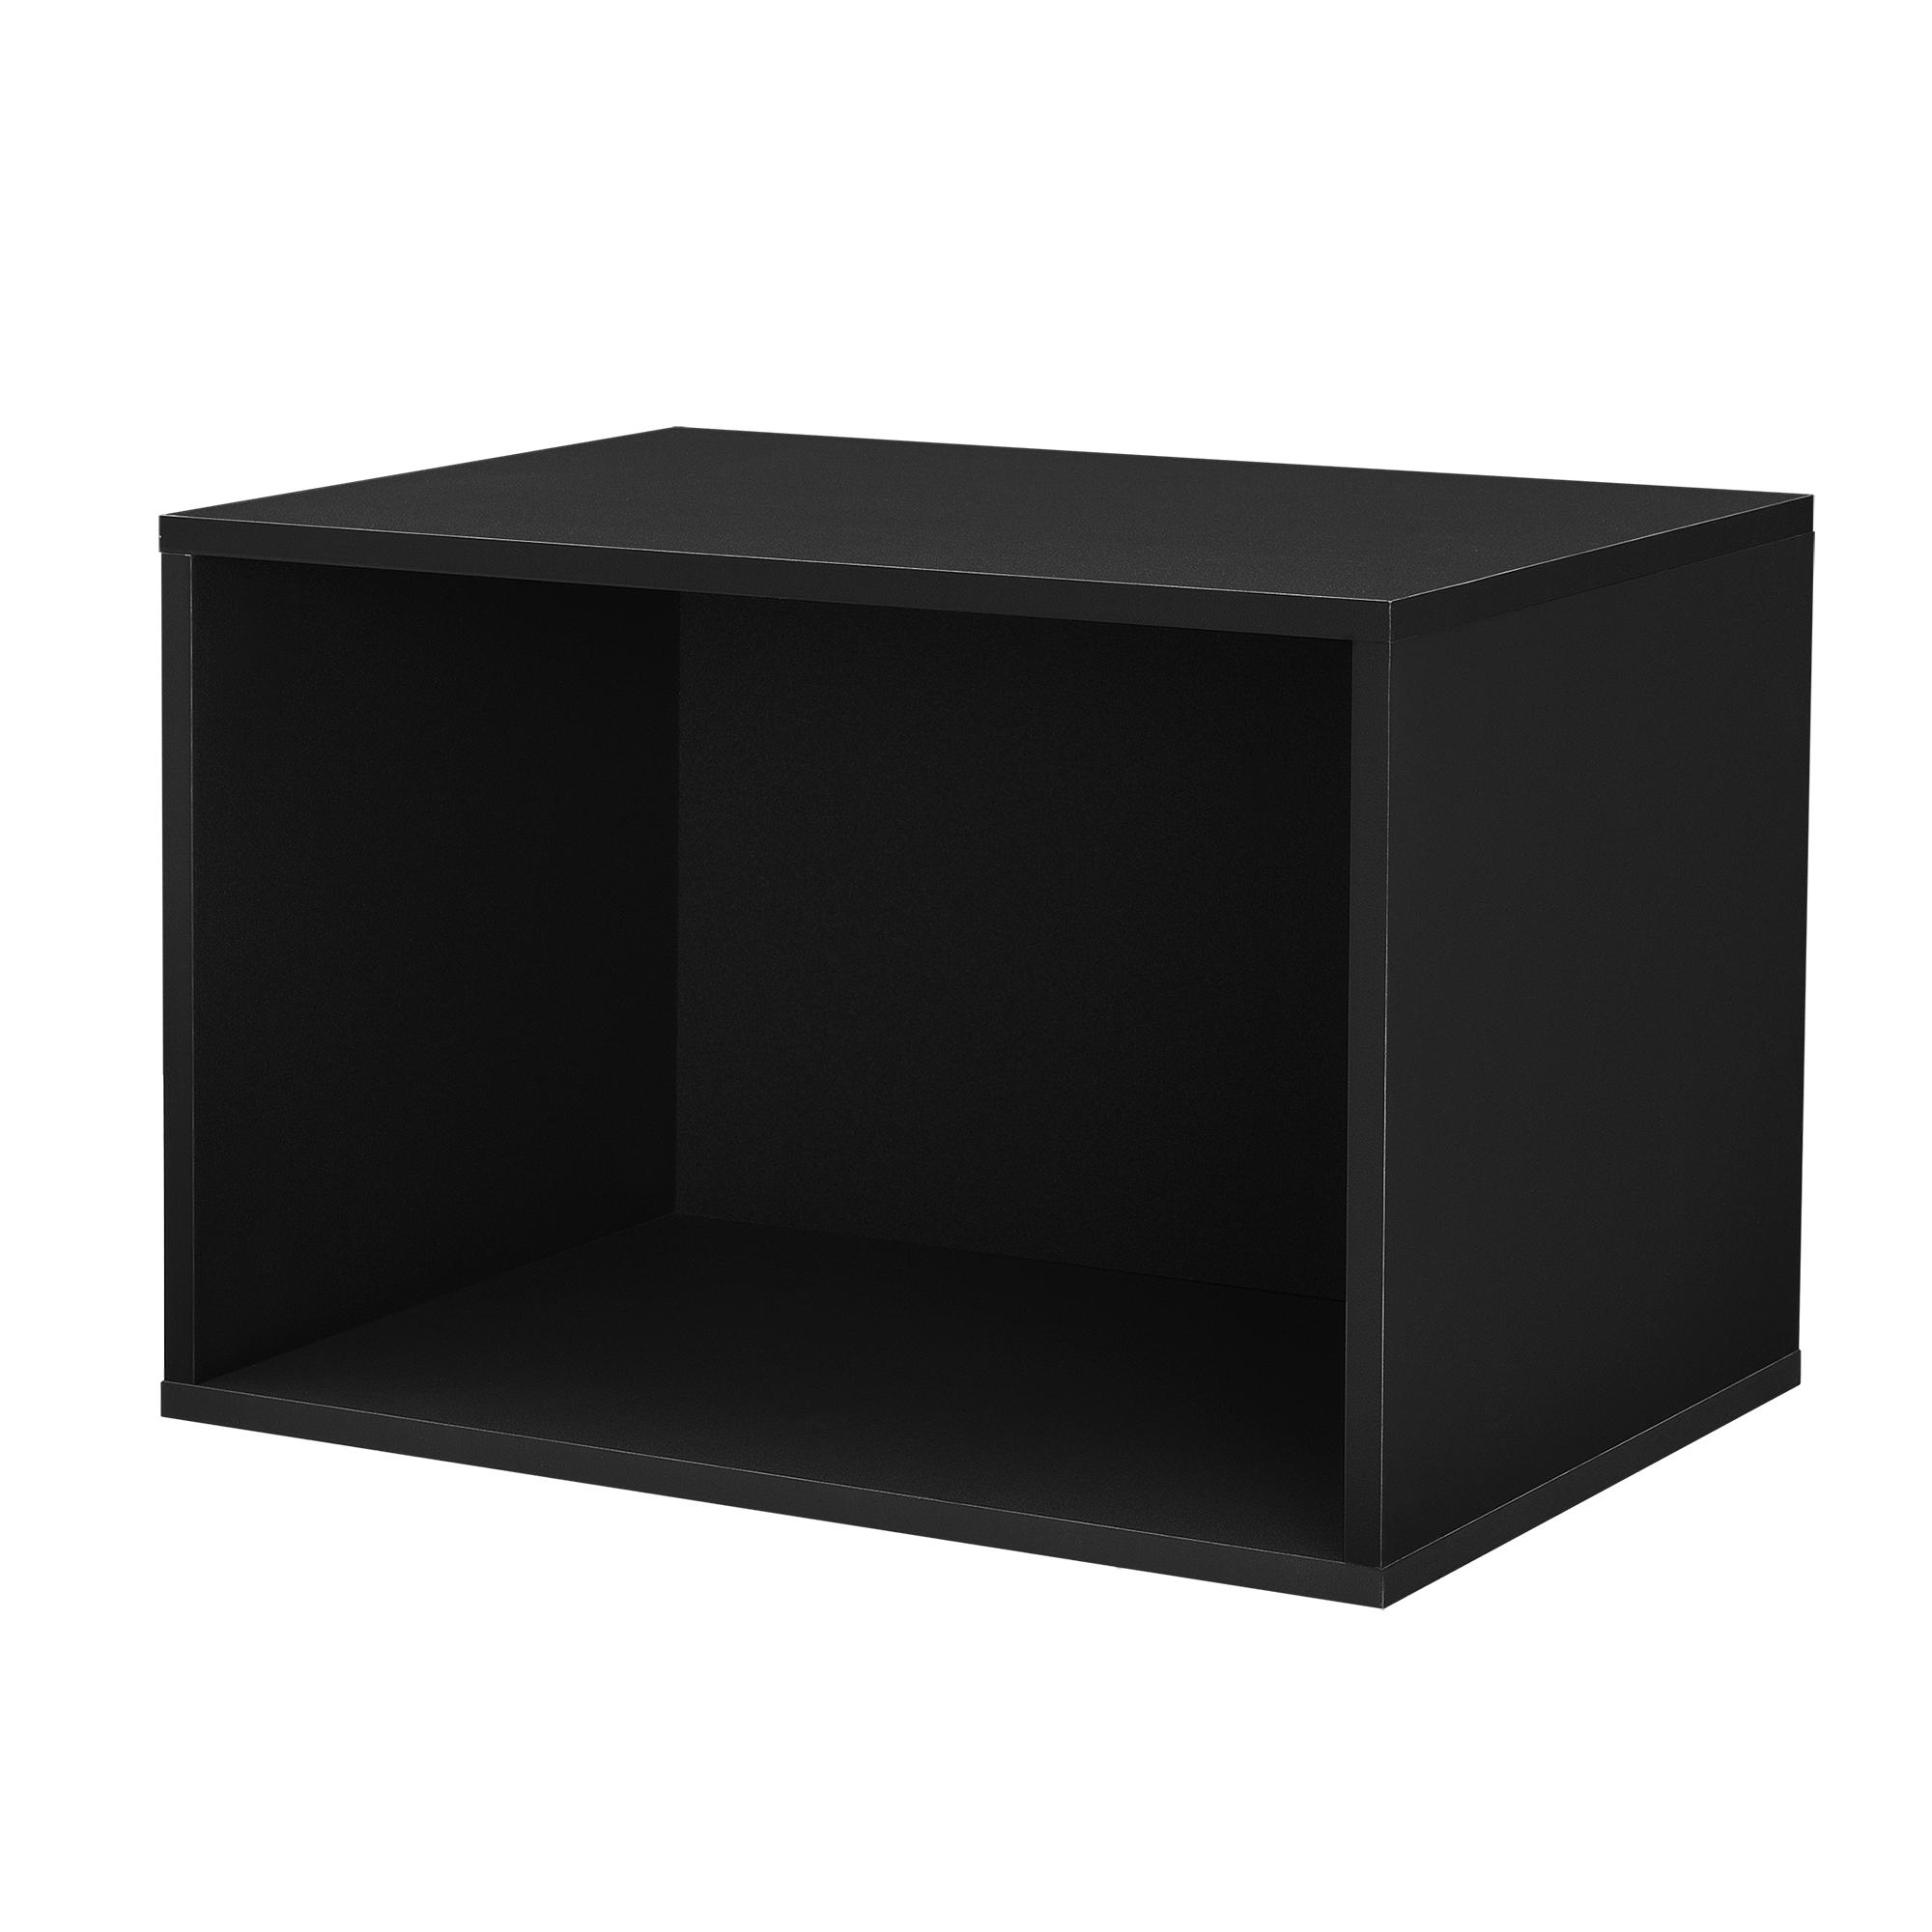 regal 45x30x30cm schwarz wandregal h ngeregal b cherregal kombinierbar ebay. Black Bedroom Furniture Sets. Home Design Ideas